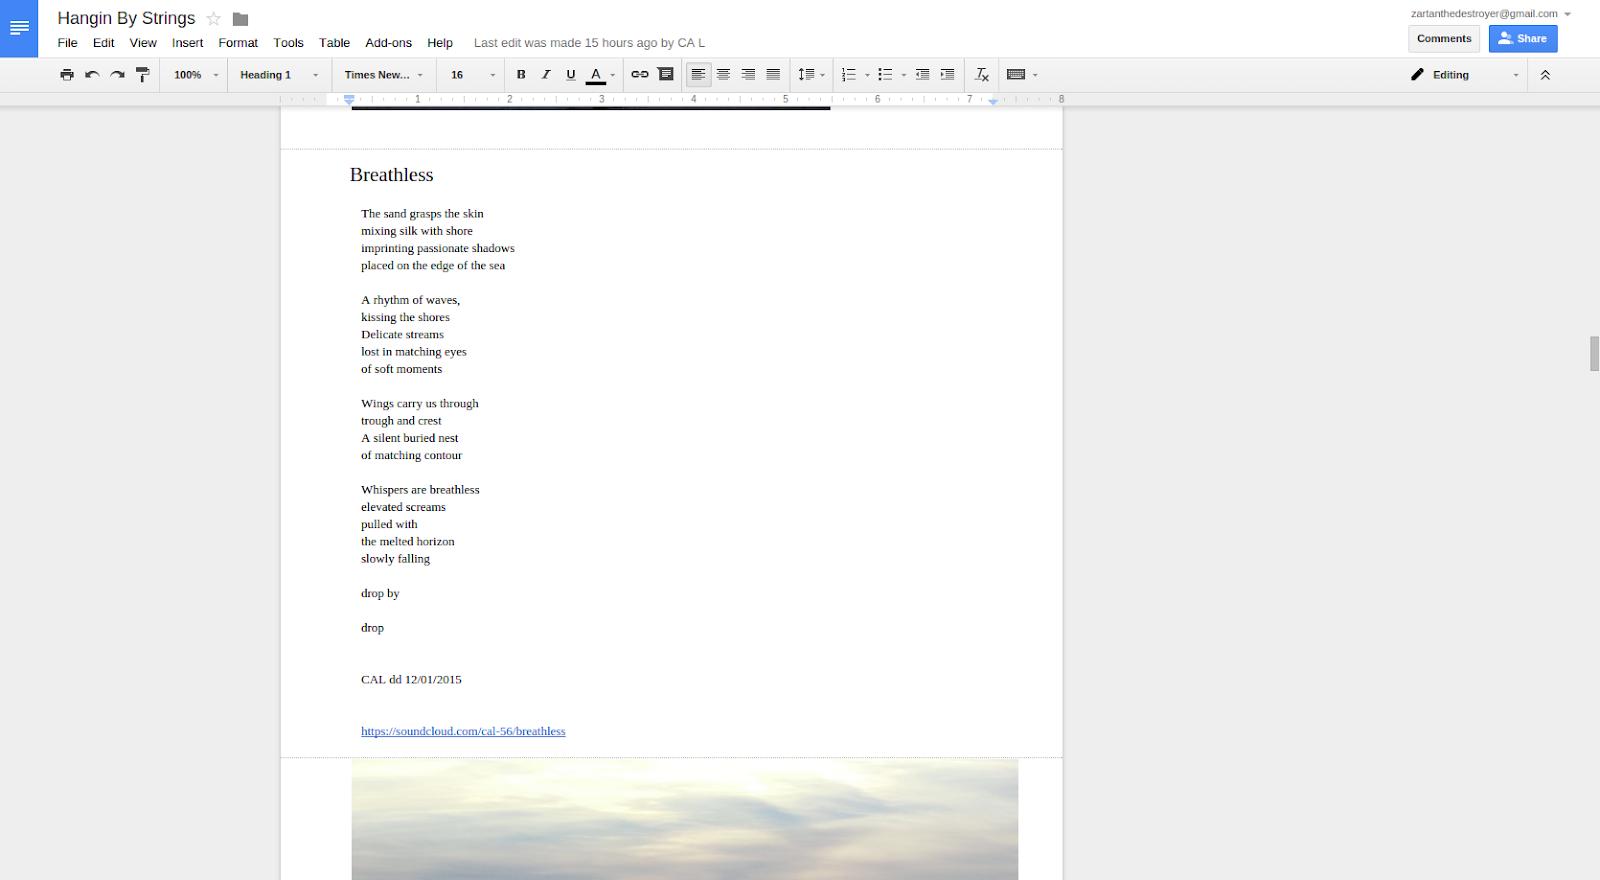 screencapture-docs-google-com-document-d-1NHlT1_sD1yXm9xekATBtJghlRHw-UIHu-7tYoQCJims-edit.png